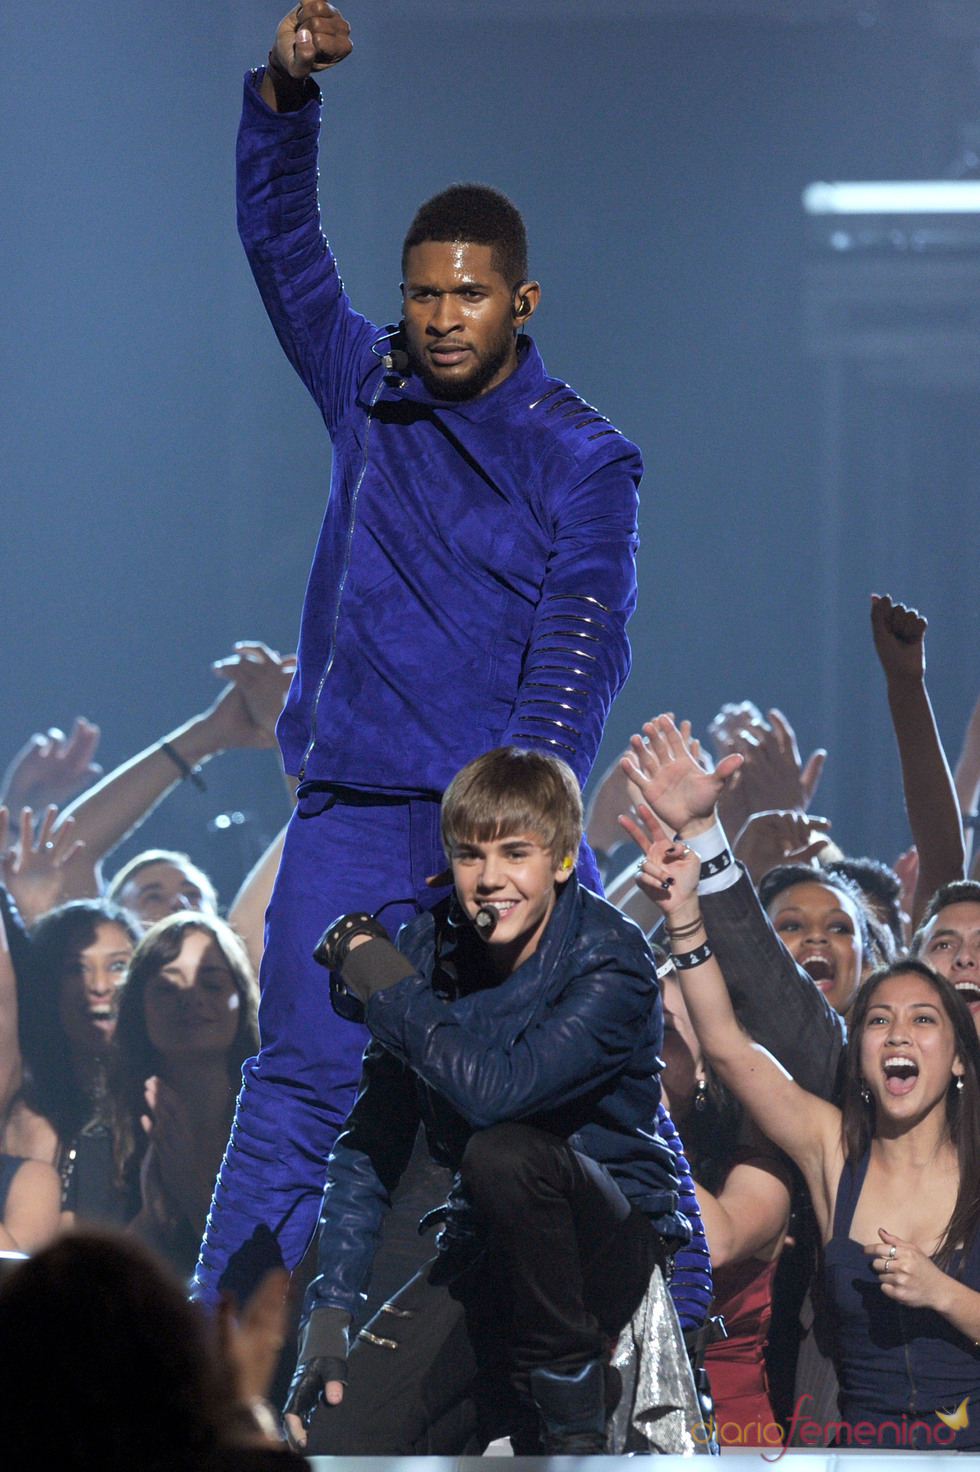 Justin Bieber y Usher en los Grammy 2011